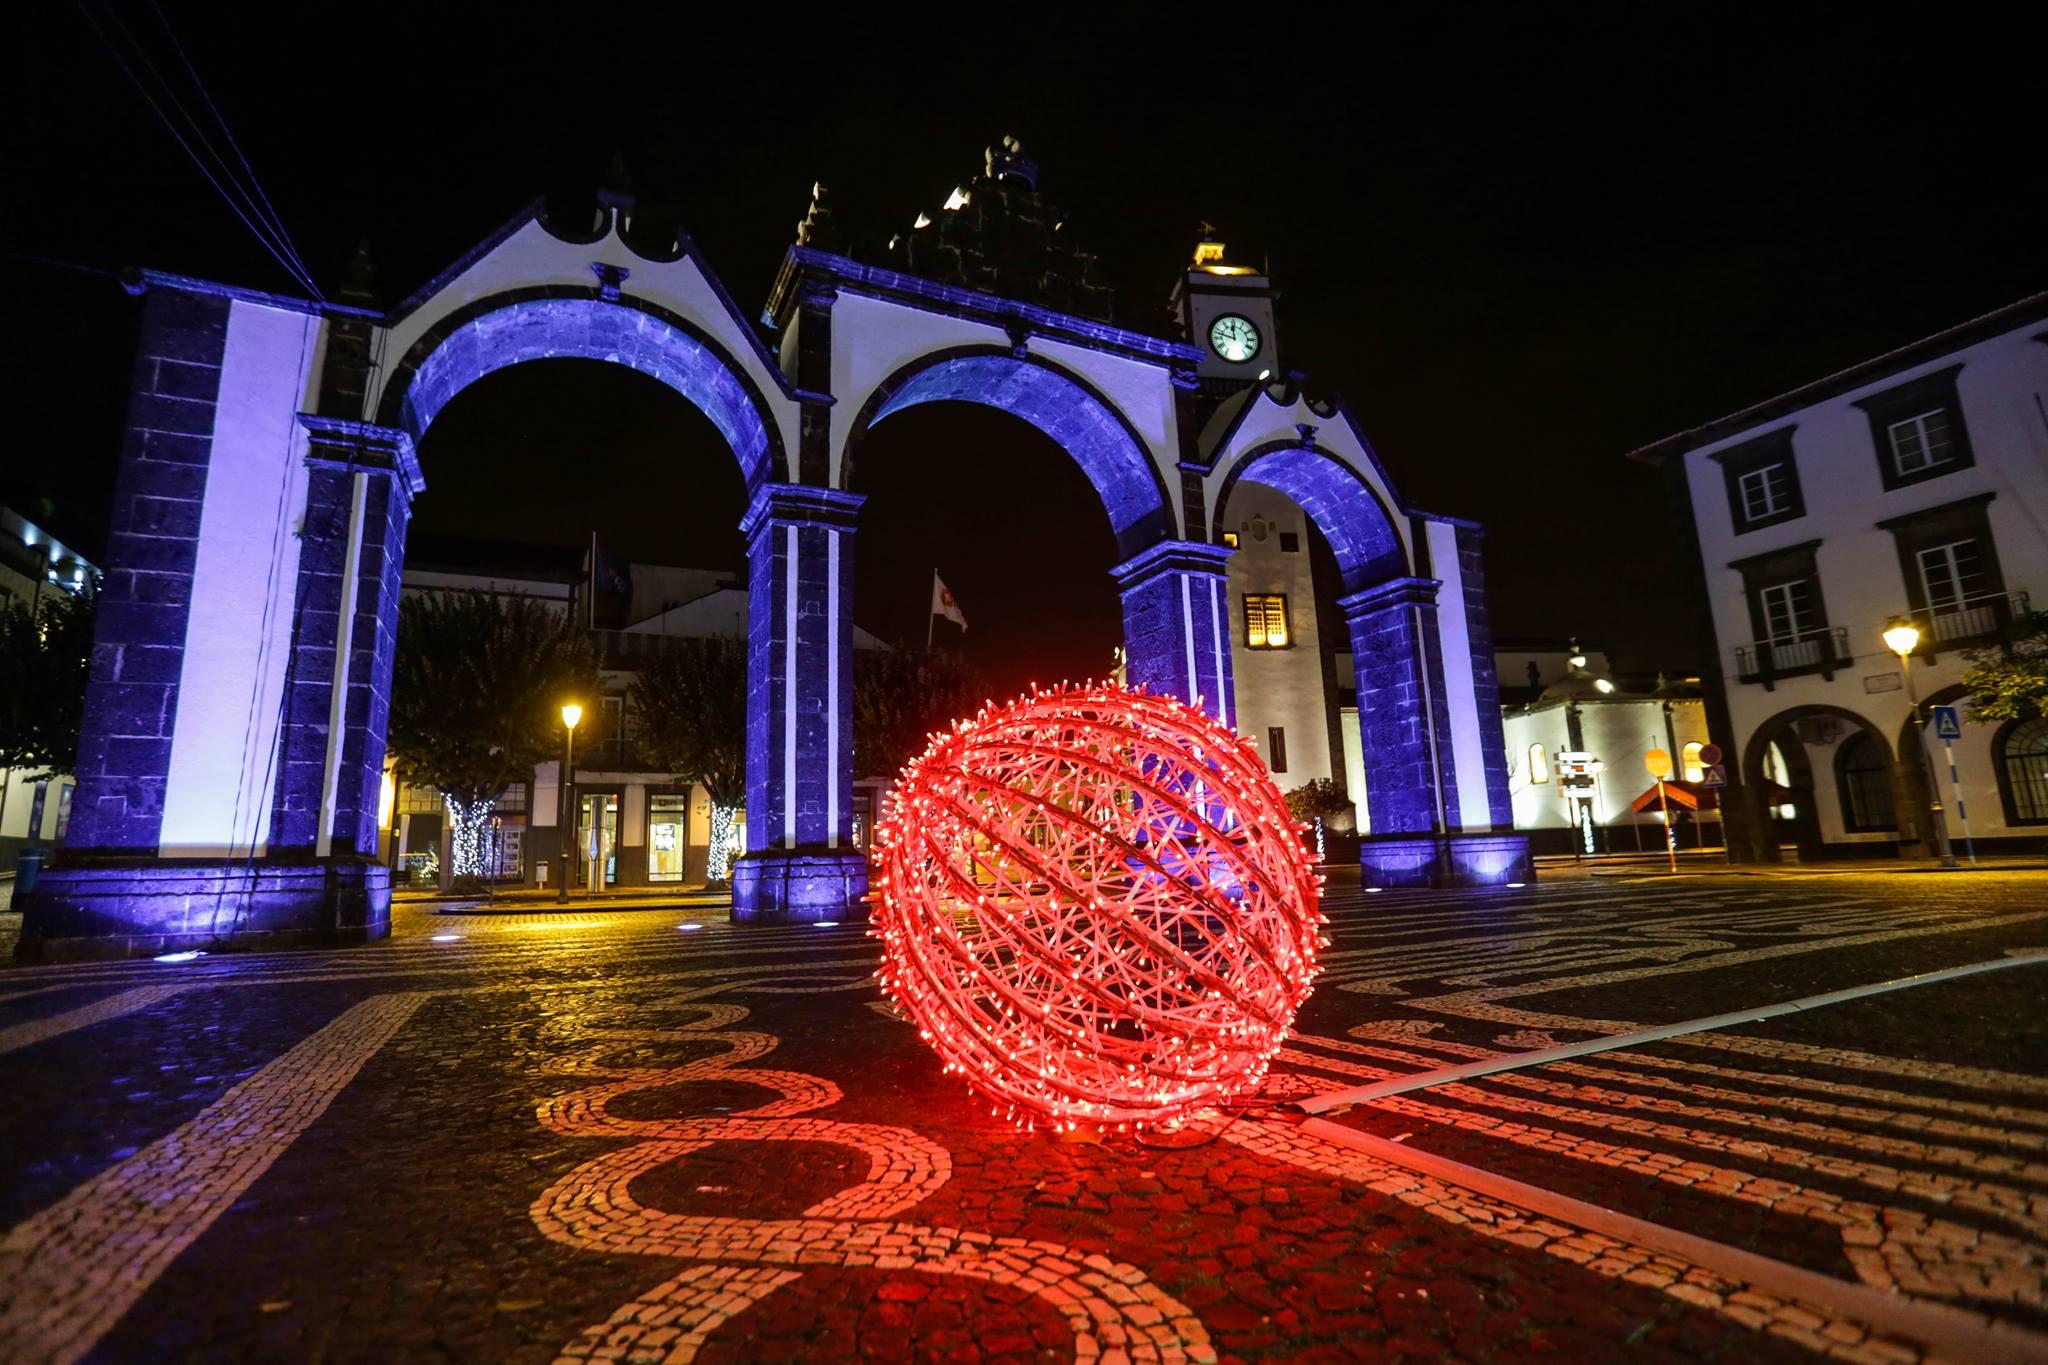 Programa de Natal em Ponta Delgada 2019